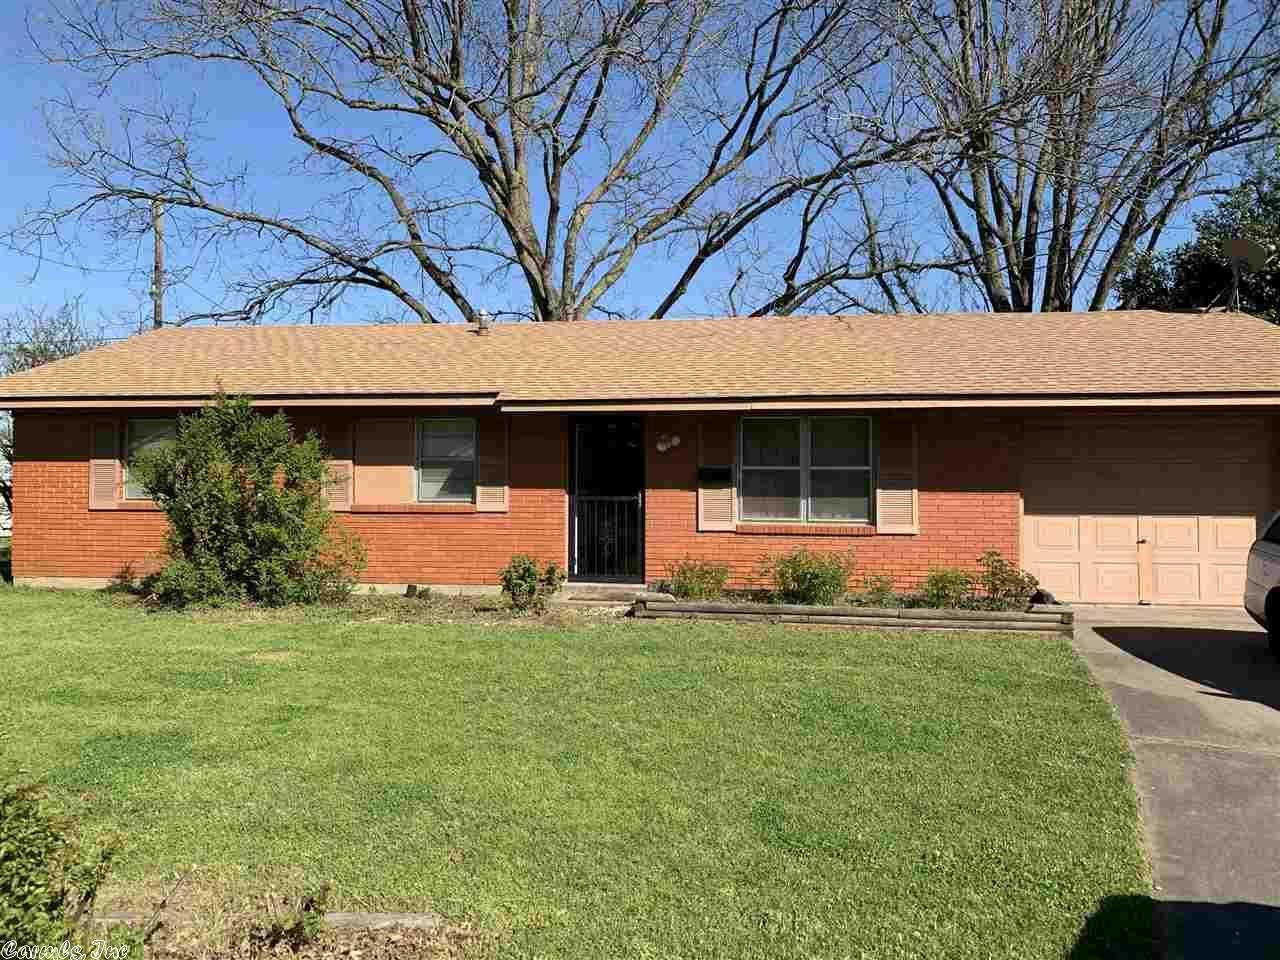 Photo for 2410 Martha Circle, Pine Bluff, AR 71602-0000 (MLS # 21008923)